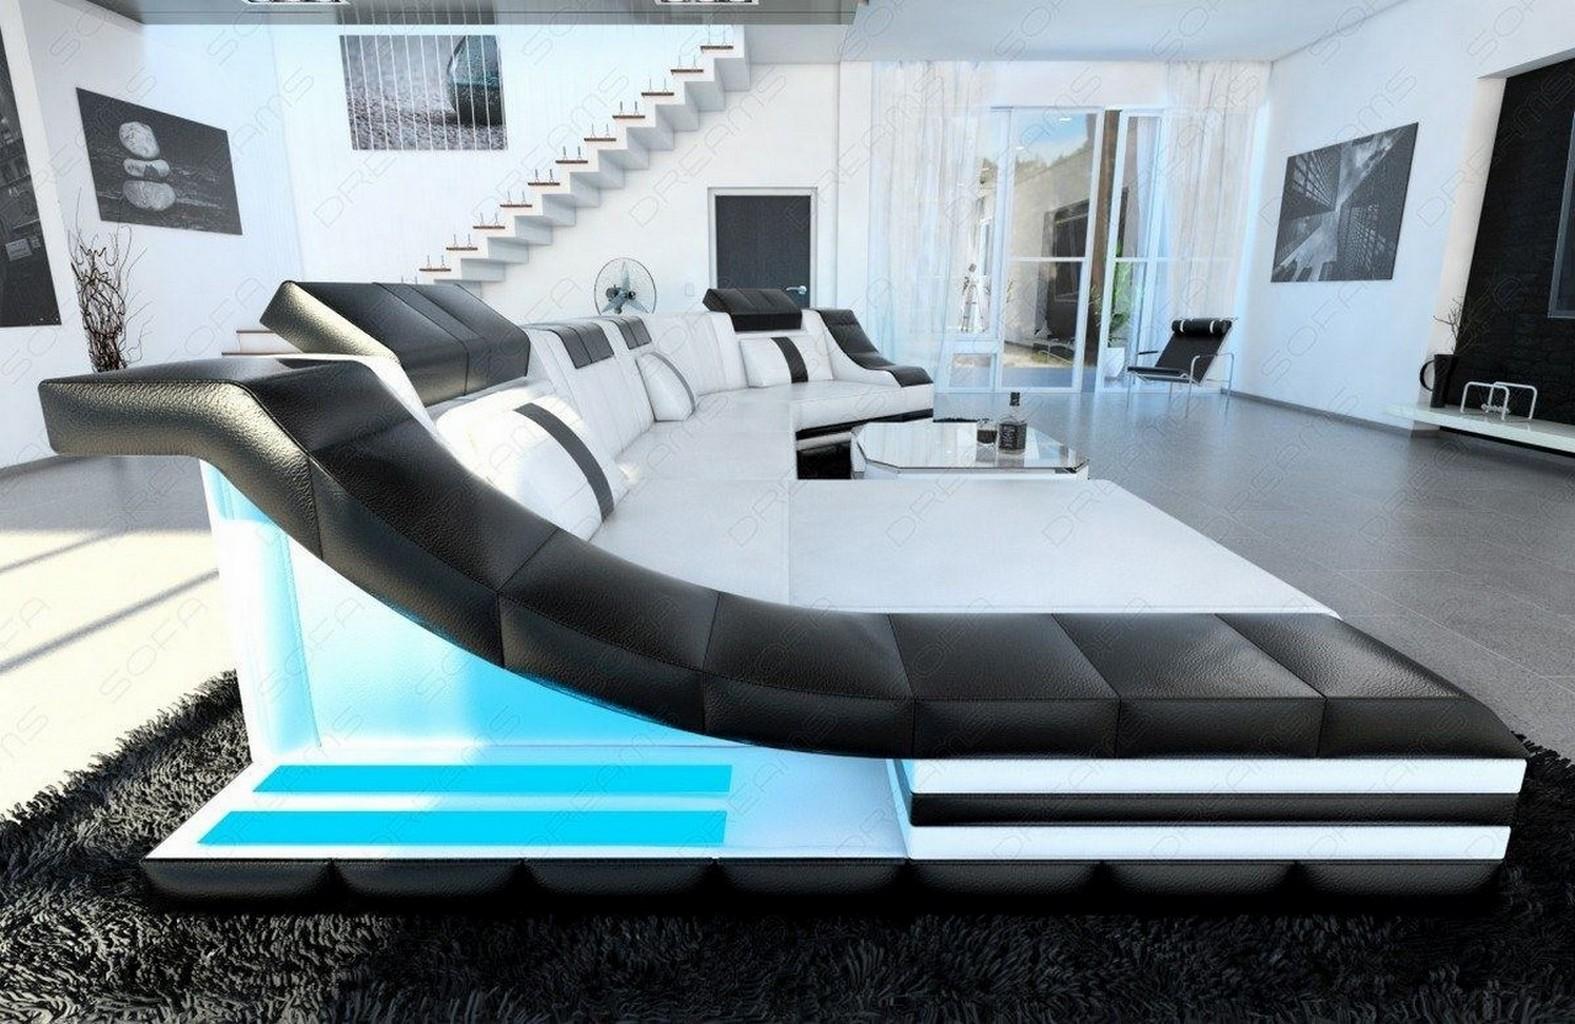 Leather Couch Turino C Form Led Lighting Designer Sofa White Black